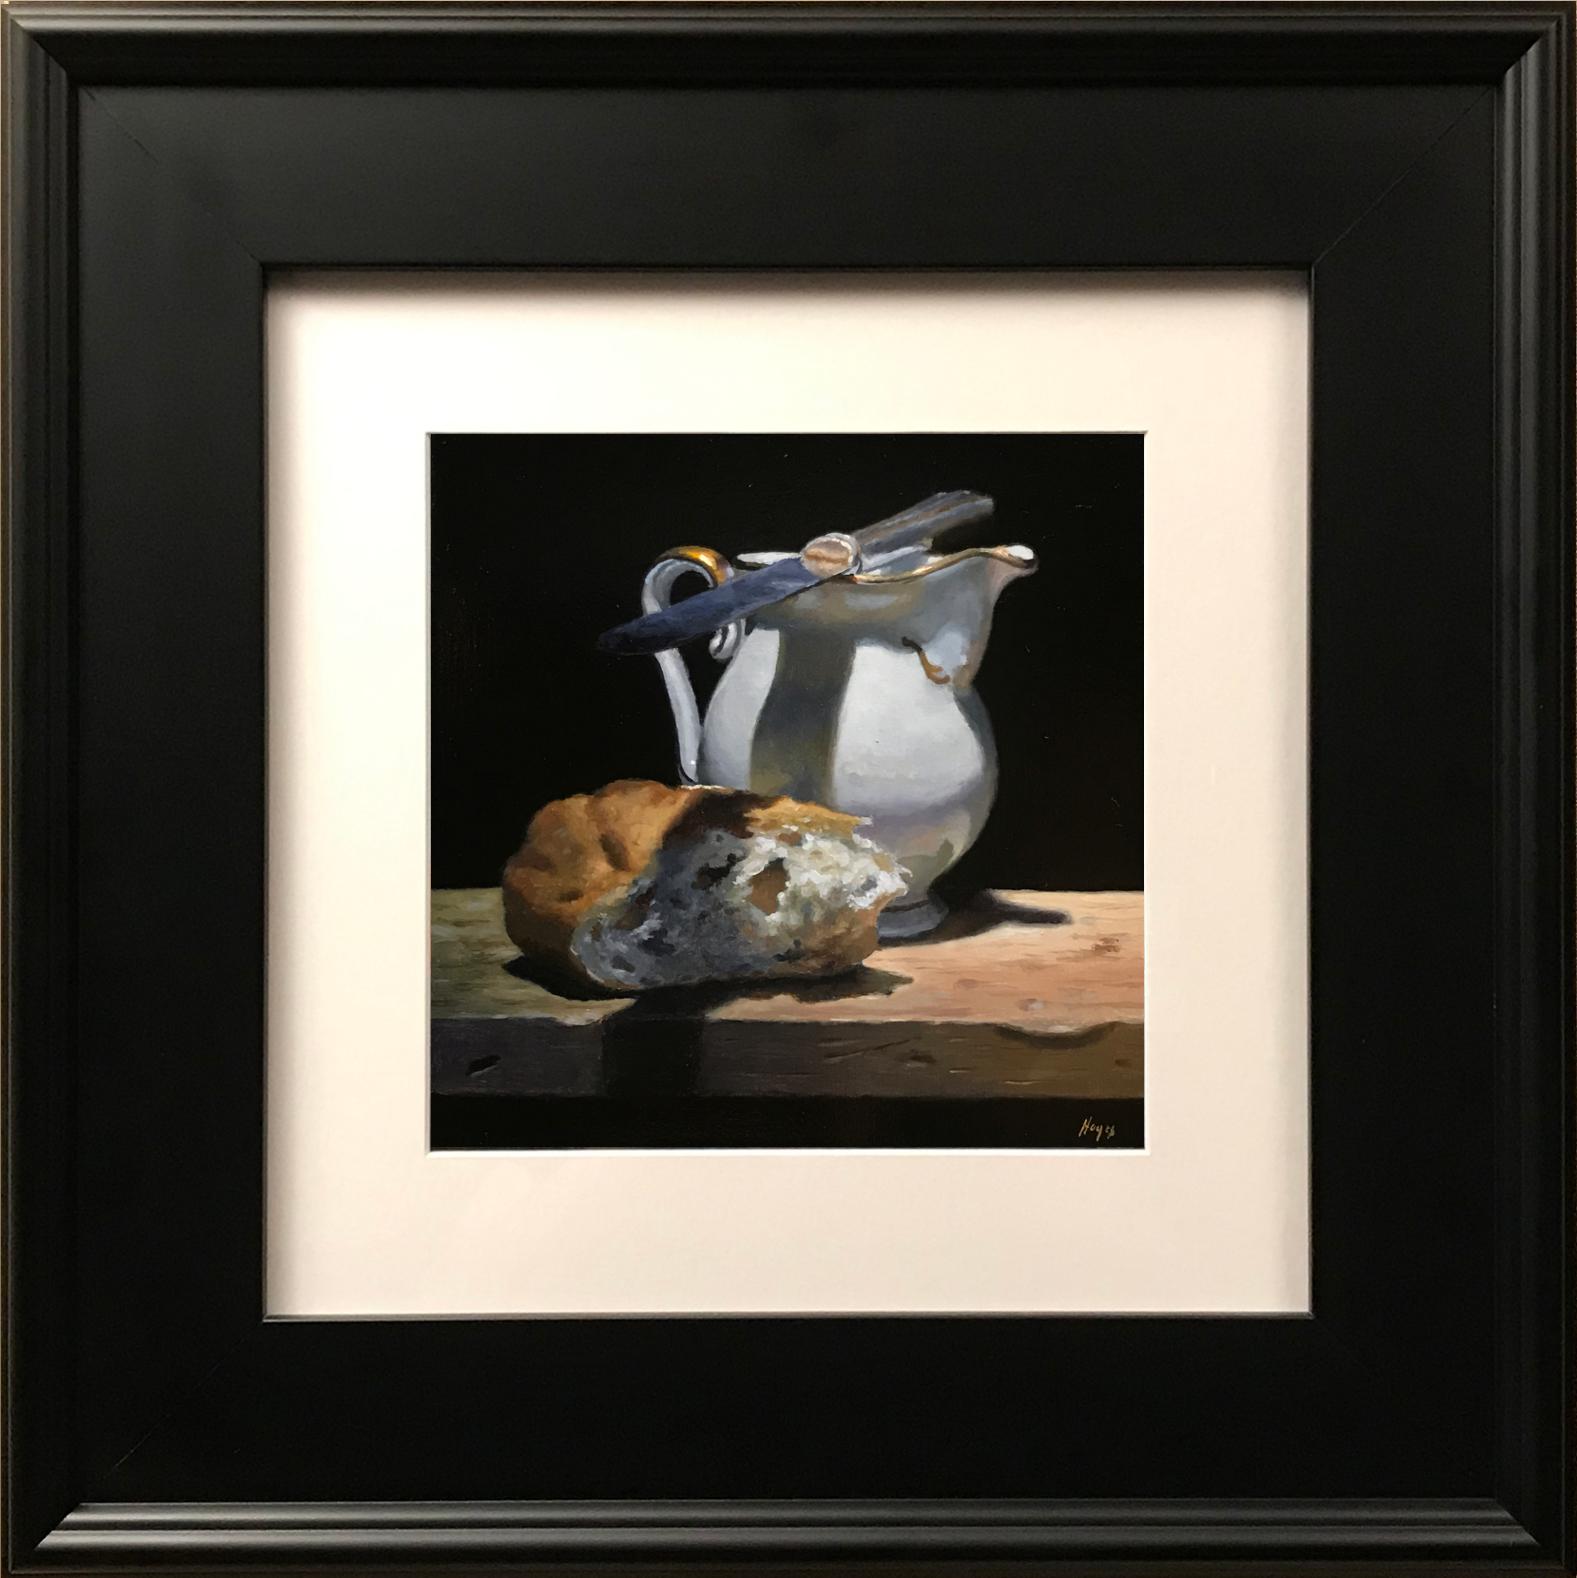 101430-square-print-plein-air-framed-black-cropped